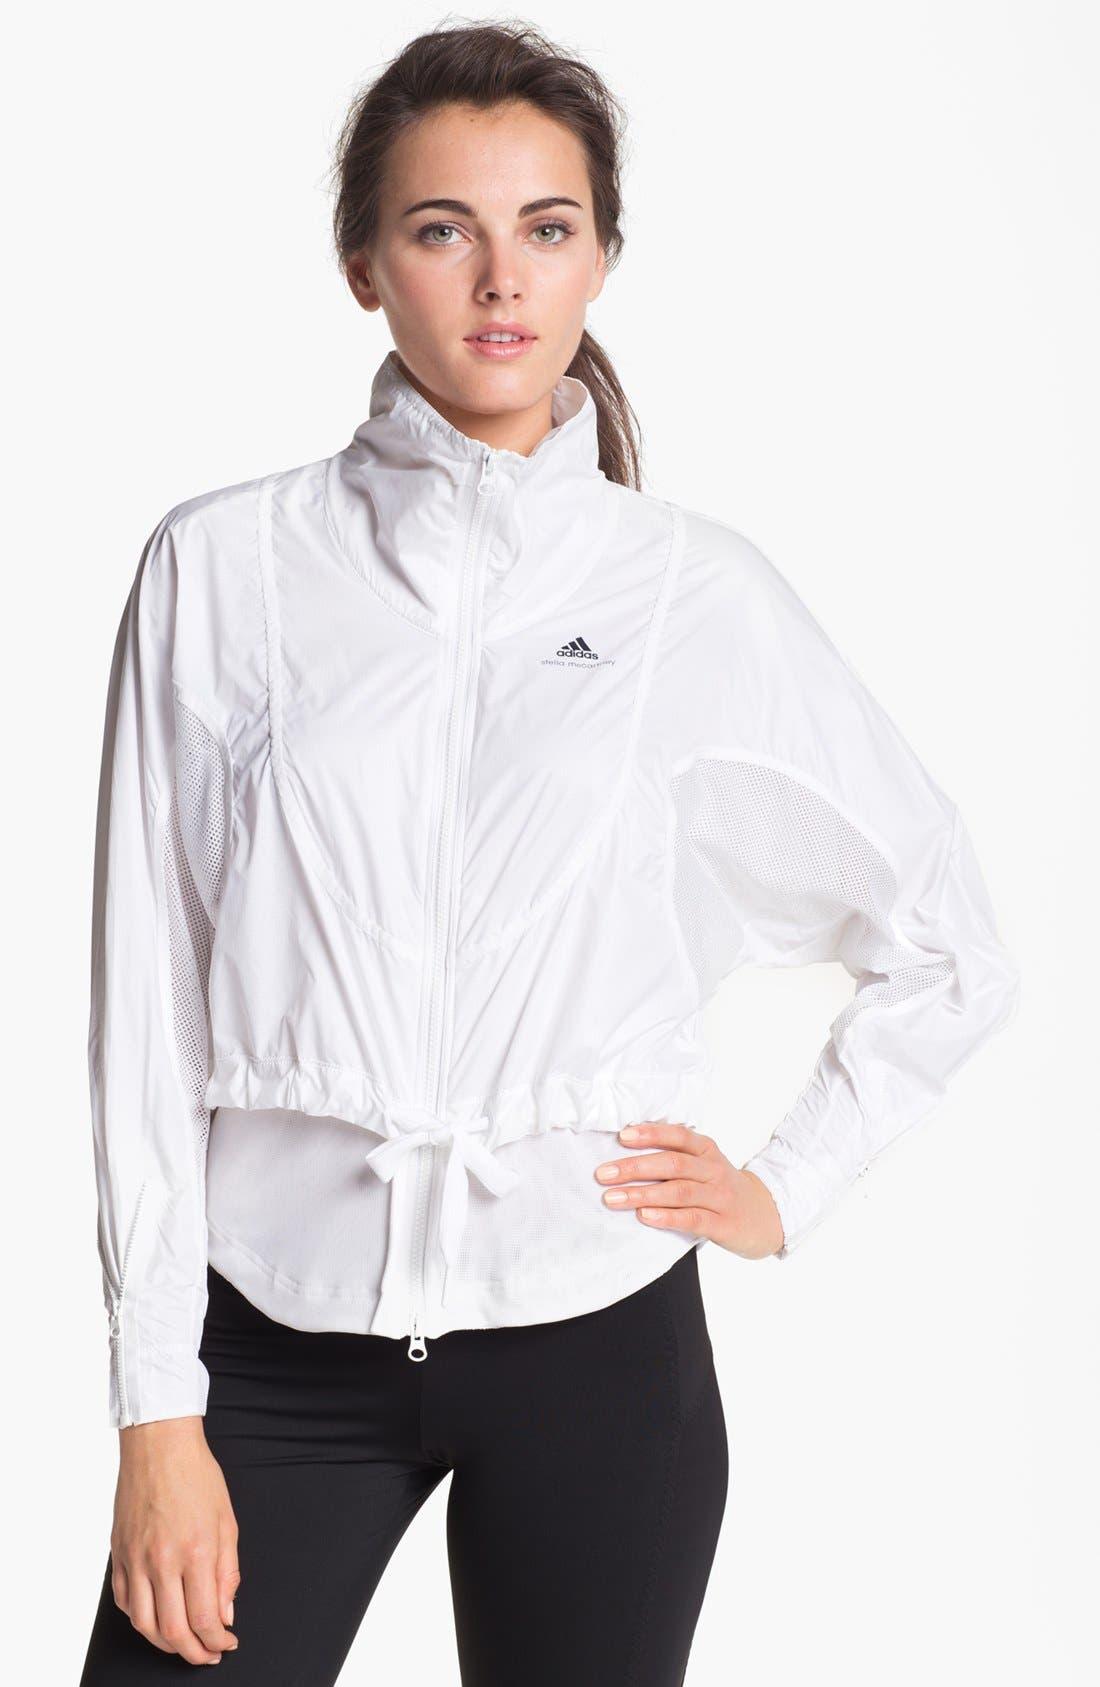 Main Image - adidas by Stella McCartney 'Barricade' Warm-Up Jacket